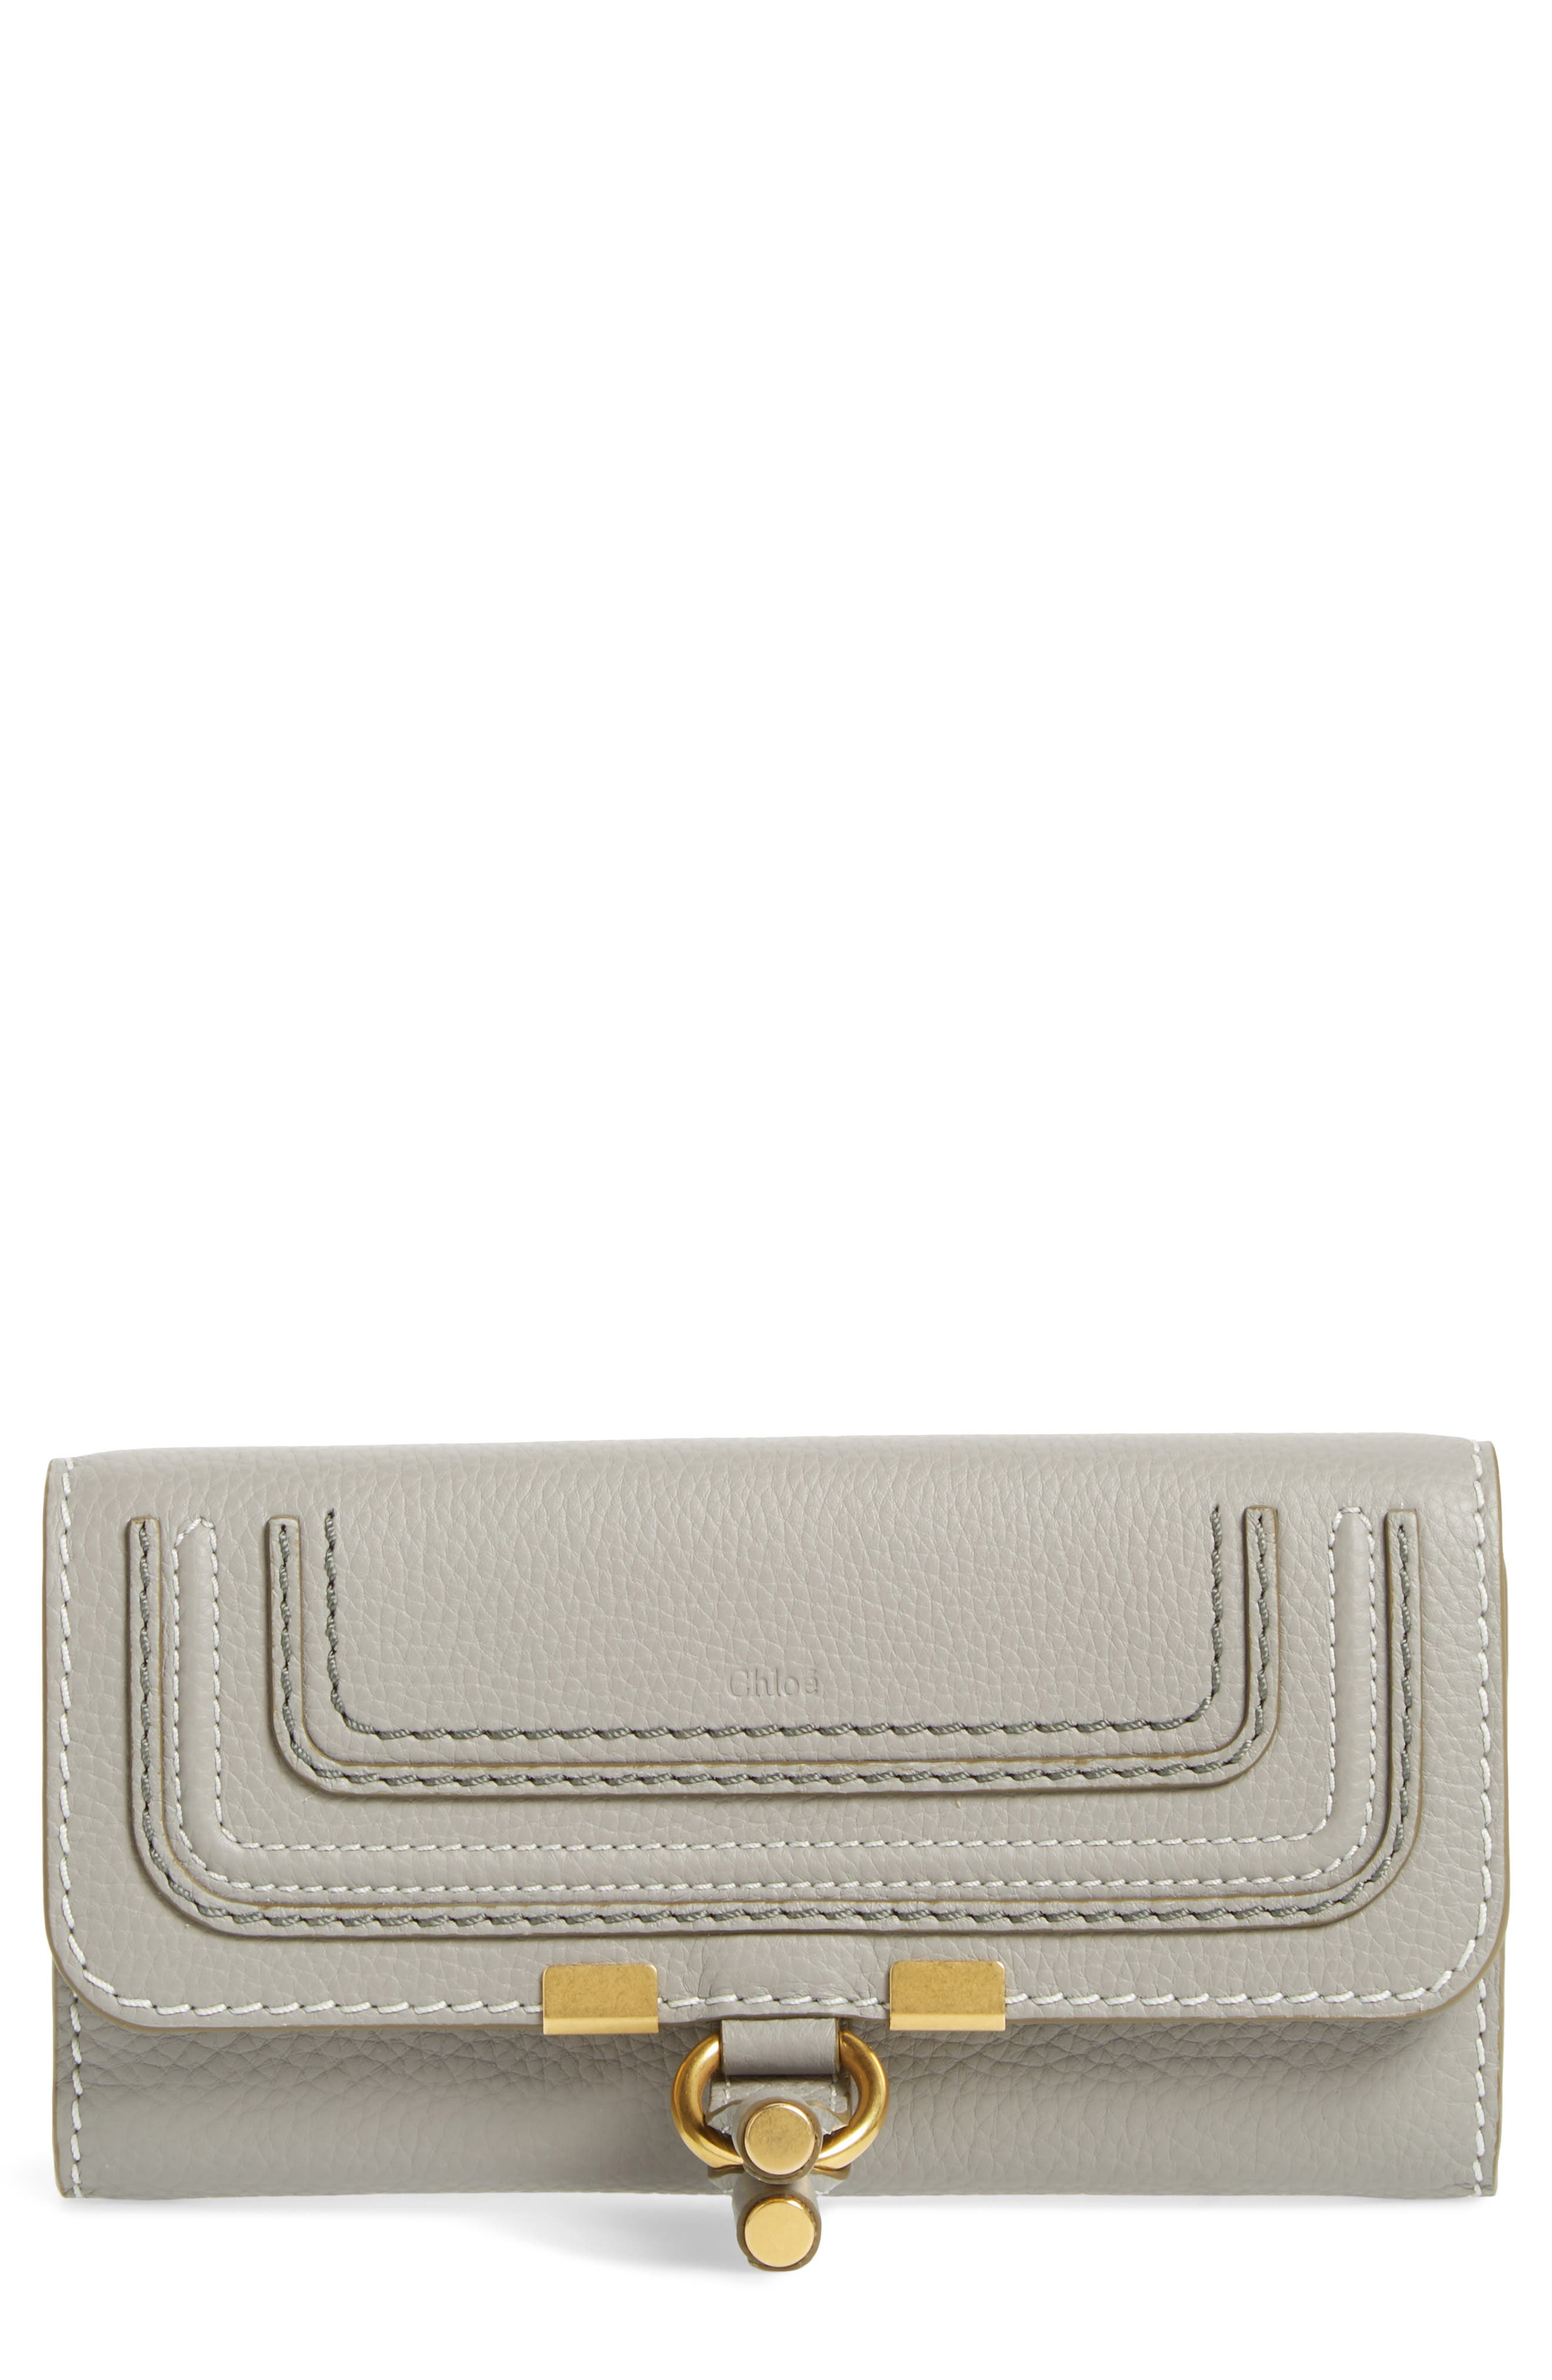 Chloé 'Marcie - Long' Leather Flap Wallet